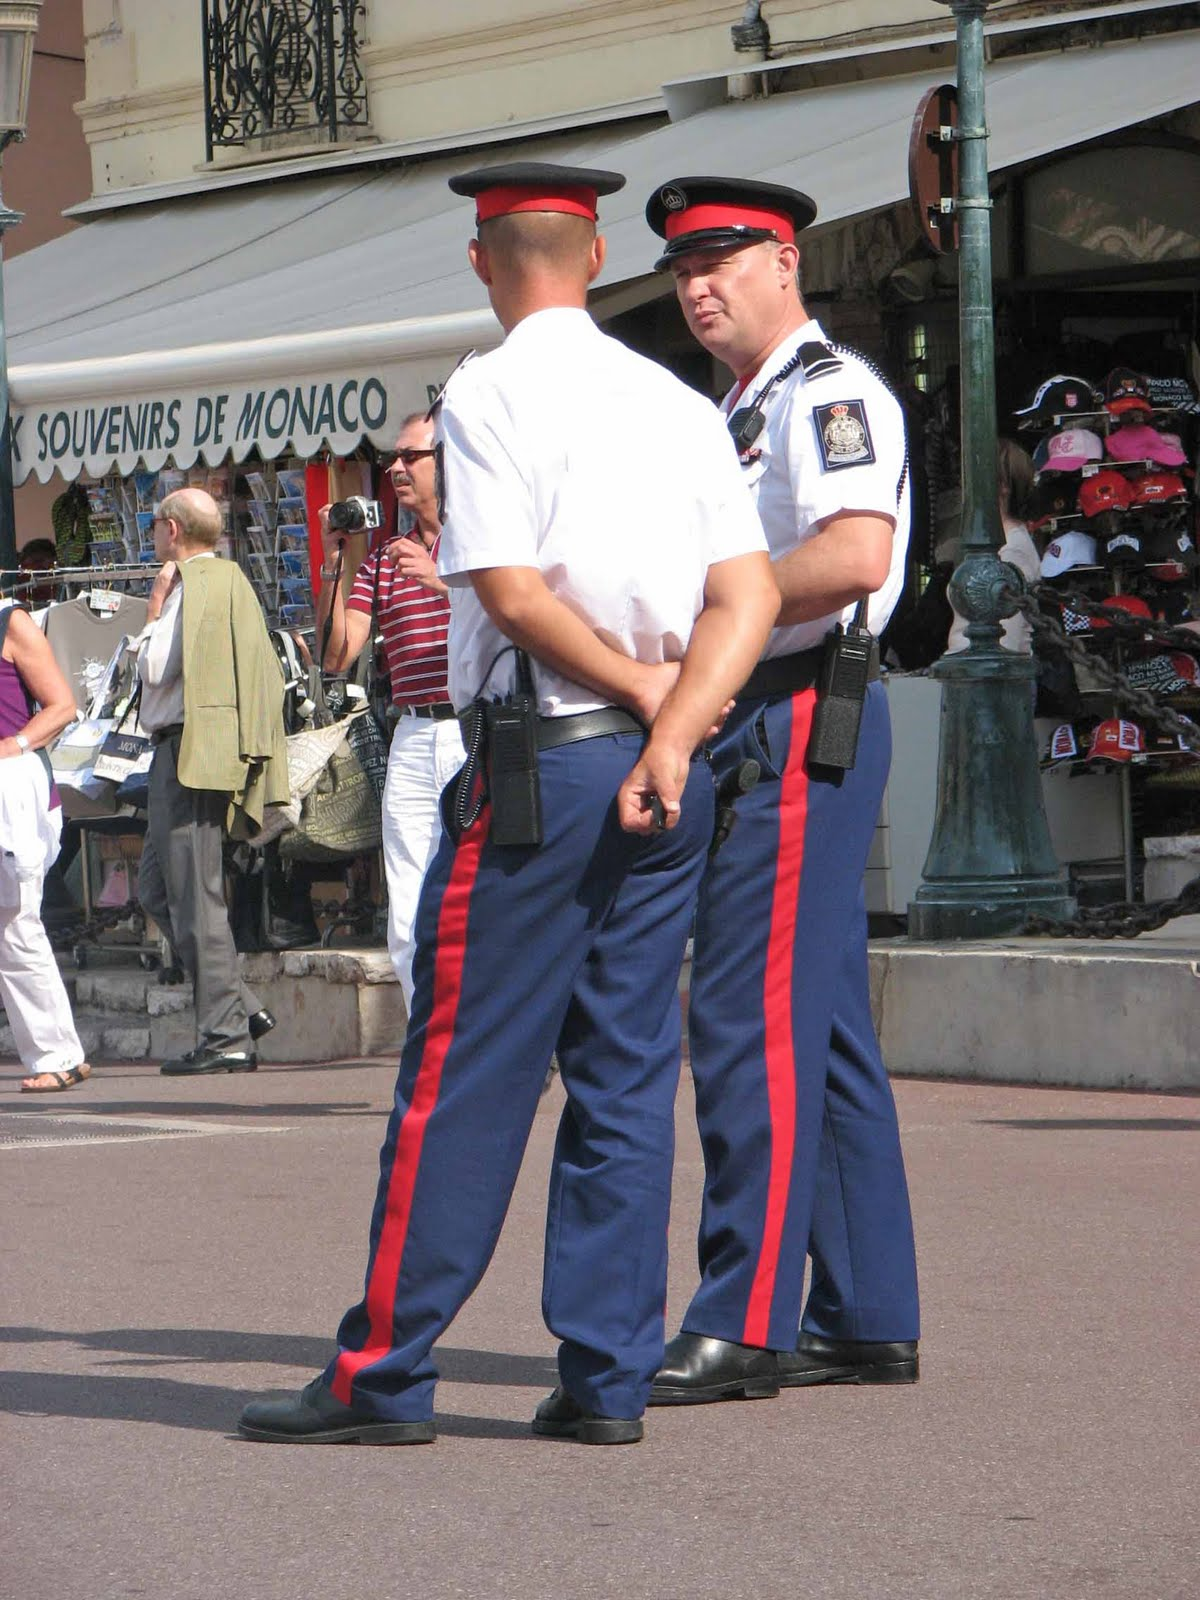 http://4.bp.blogspot.com/_xJeBWfrpmx4/SxJBlJGvjYI/AAAAAAAAAoM/INz8TqaVAd8/s1600/Gendarmes+near+the+palace,+Monaco+2.jpg